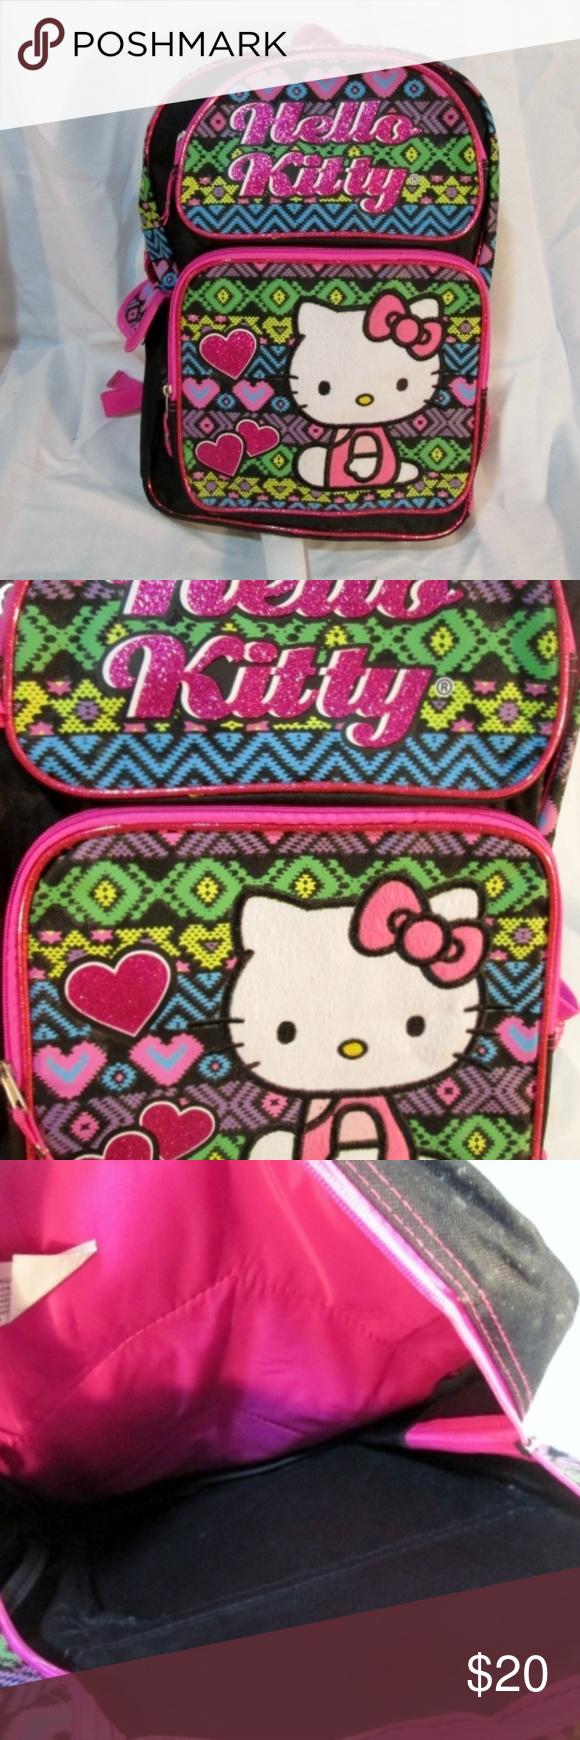 a92d1091d9 HELLO KITTY Glitter BACKPACK Shoulder Rucksack Bag Beautiful HELLO KITTY  backpack   rucksack   travel bag